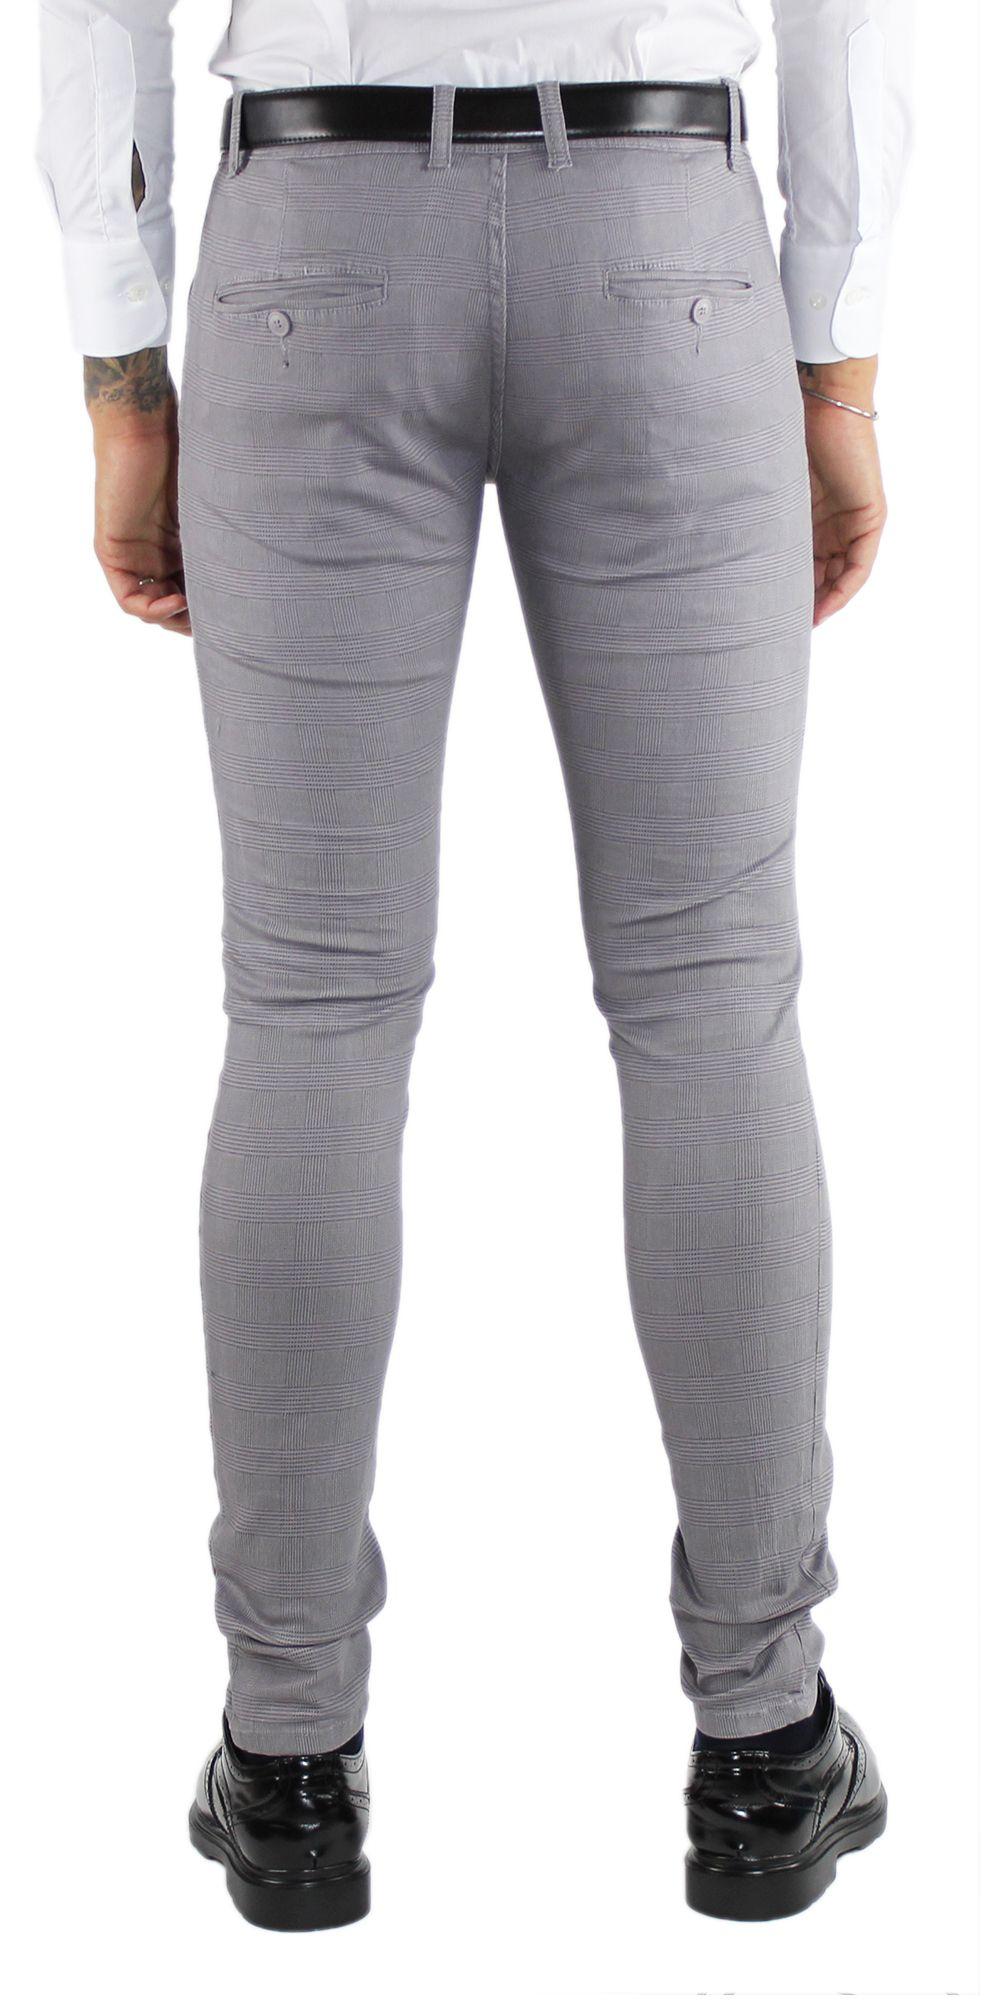 Pantaloni-Uomo-Invernali-a-Quadri-Eleganti-Pantalone-Slim-Fit-Elasticizzati-Scoz miniatura 5